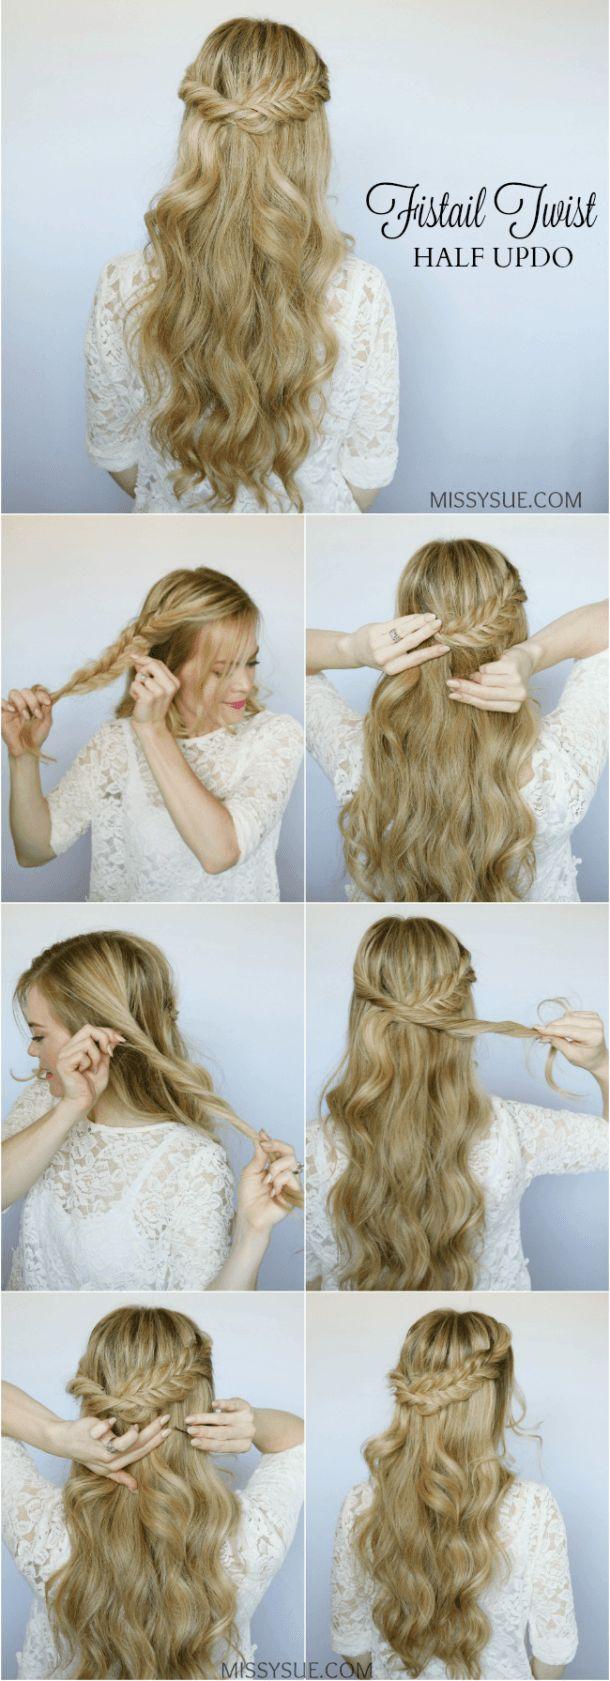 Superb 1000 Ideas About Half Updo Tutorial On Pinterest Bouffant Hair Short Hairstyles Gunalazisus